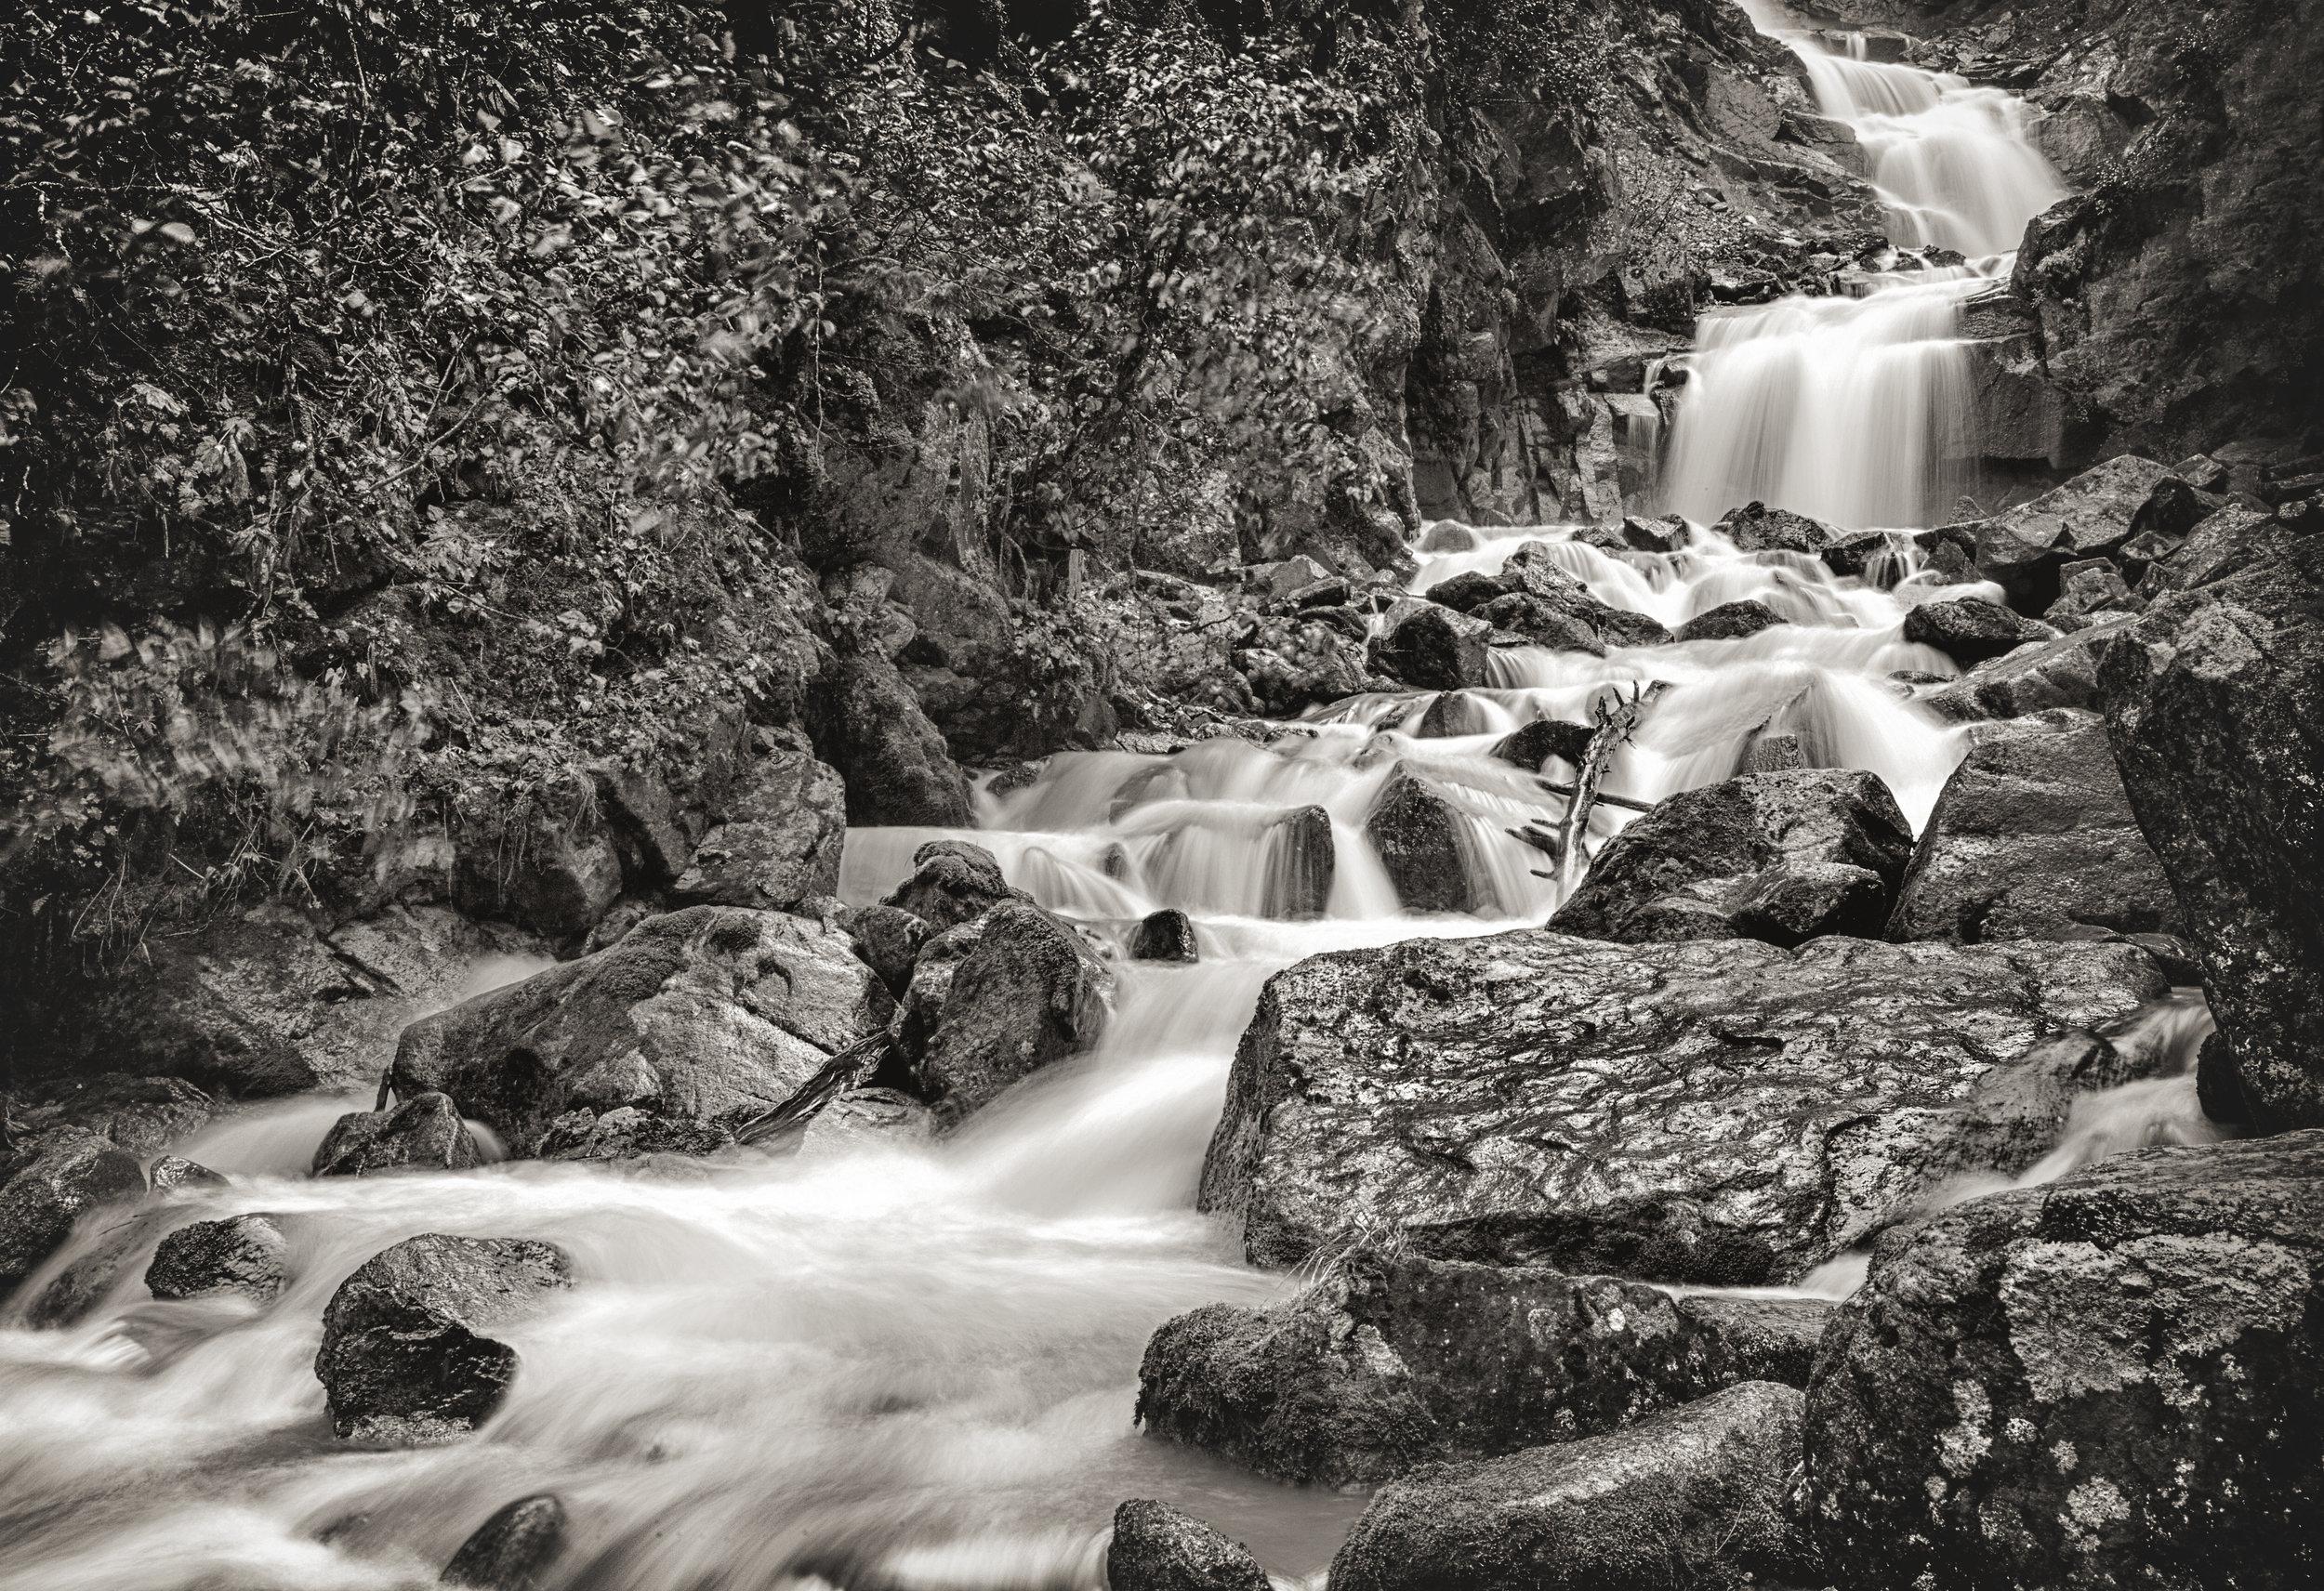 Lower Reid Falls, Skagway - Across the Blue Planet